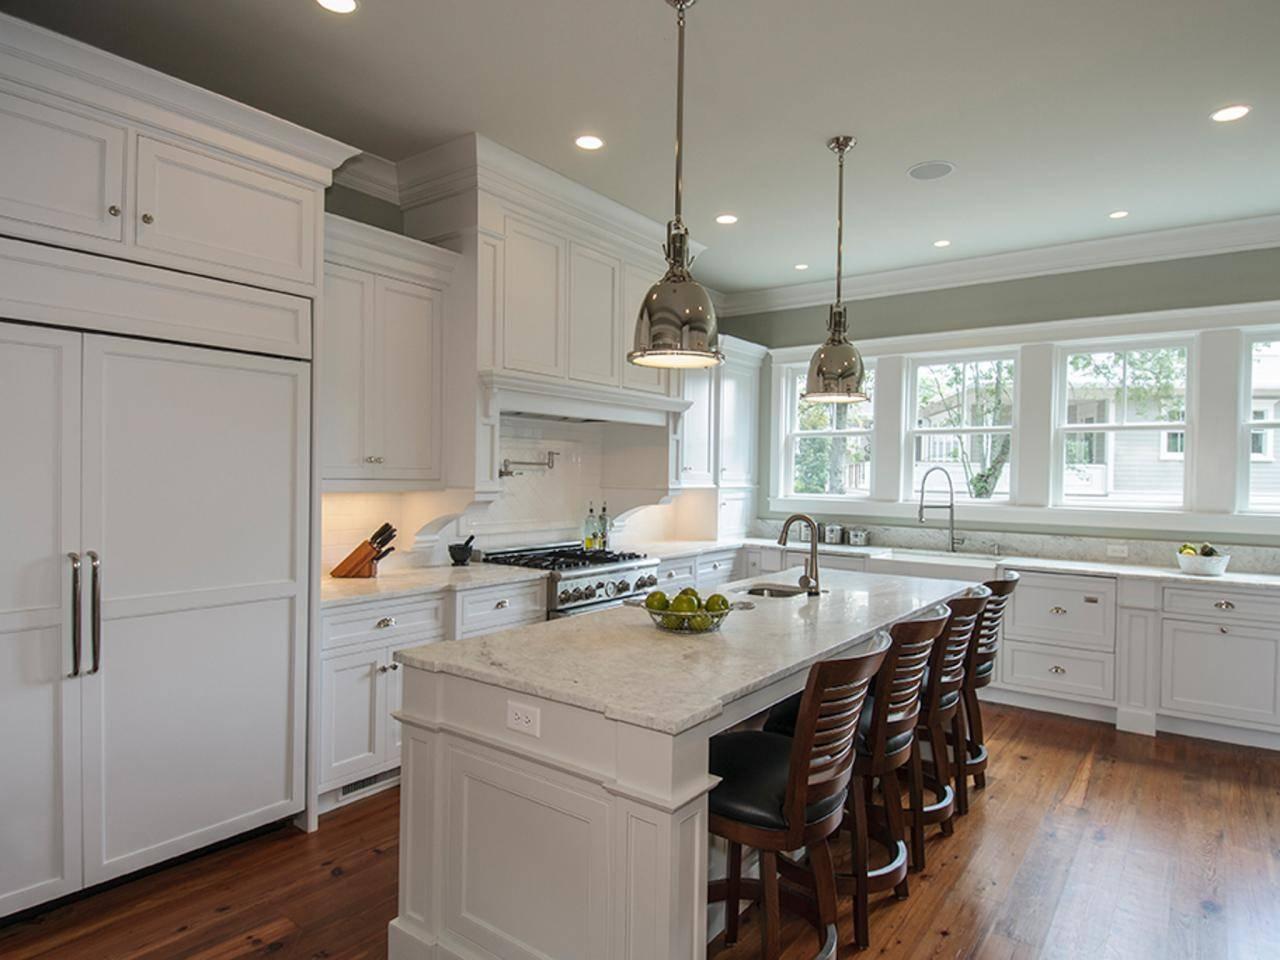 Kitchen Pendant Lighting (View 8 of 15)